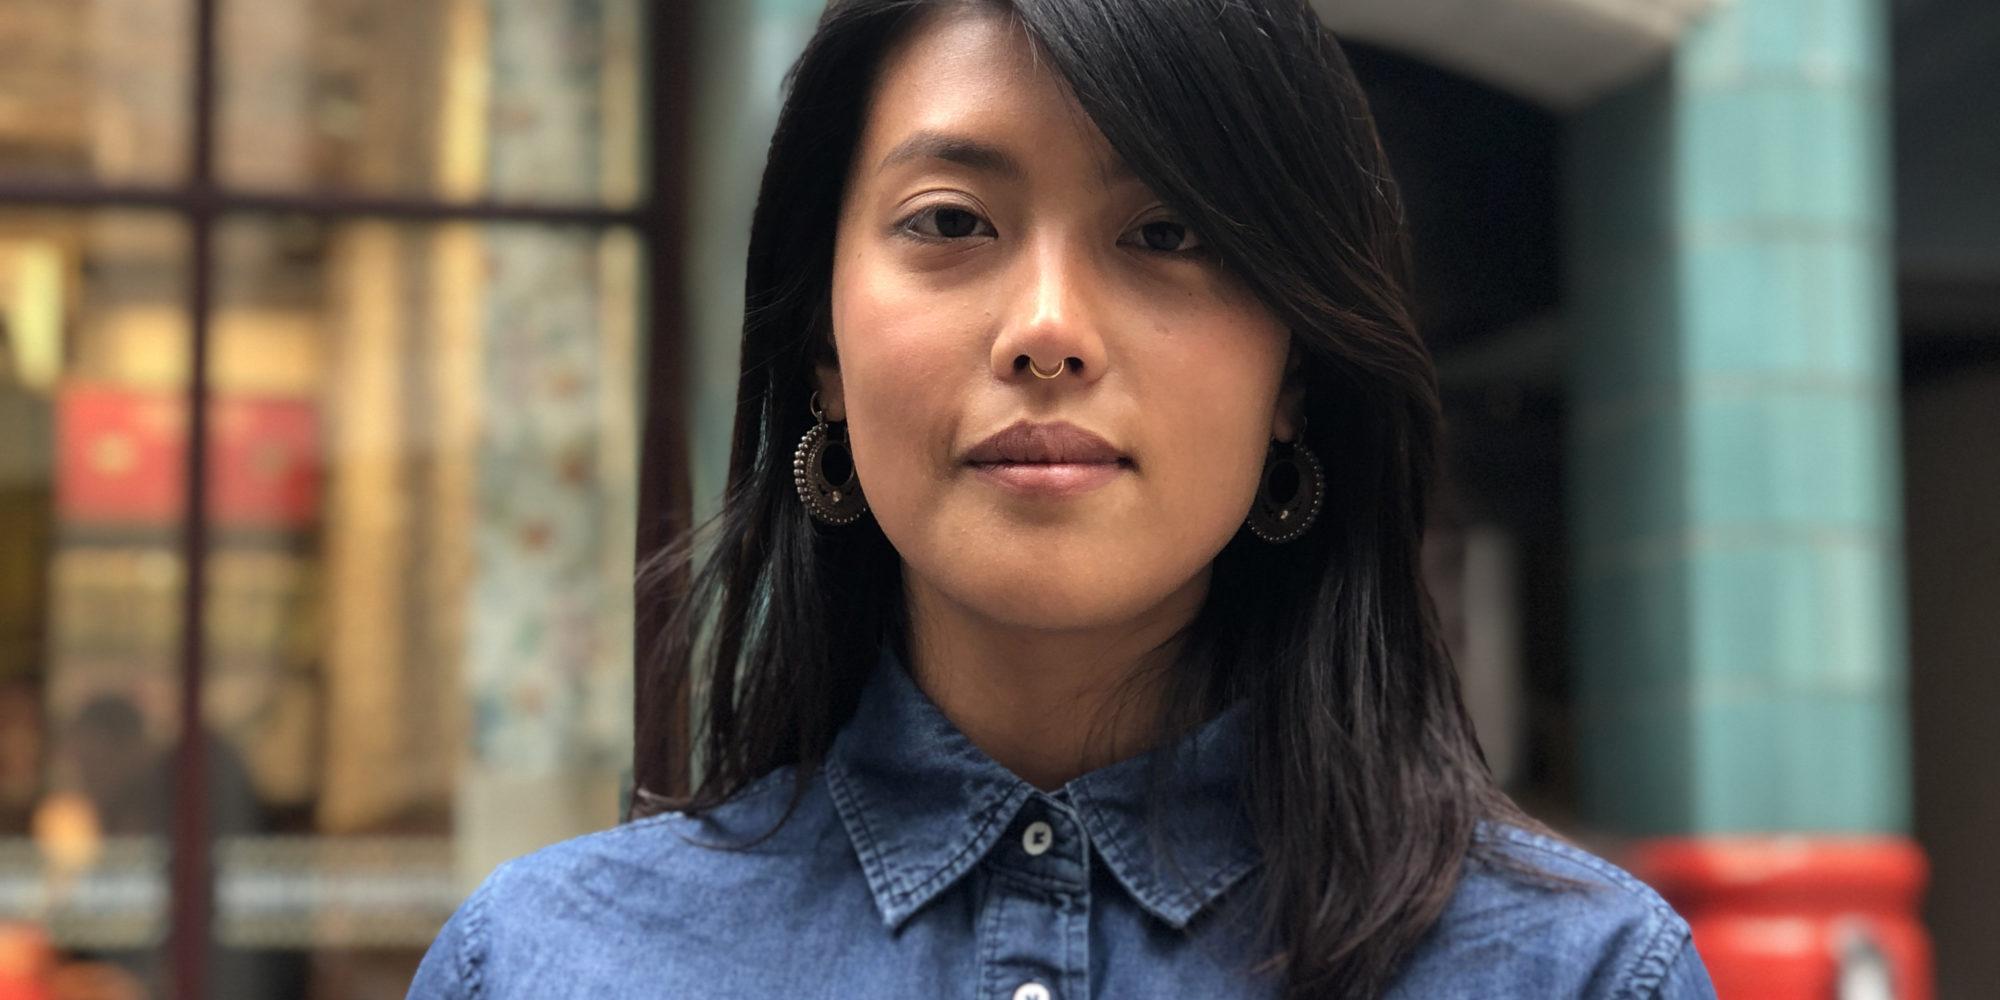 Carmellia Indrawati